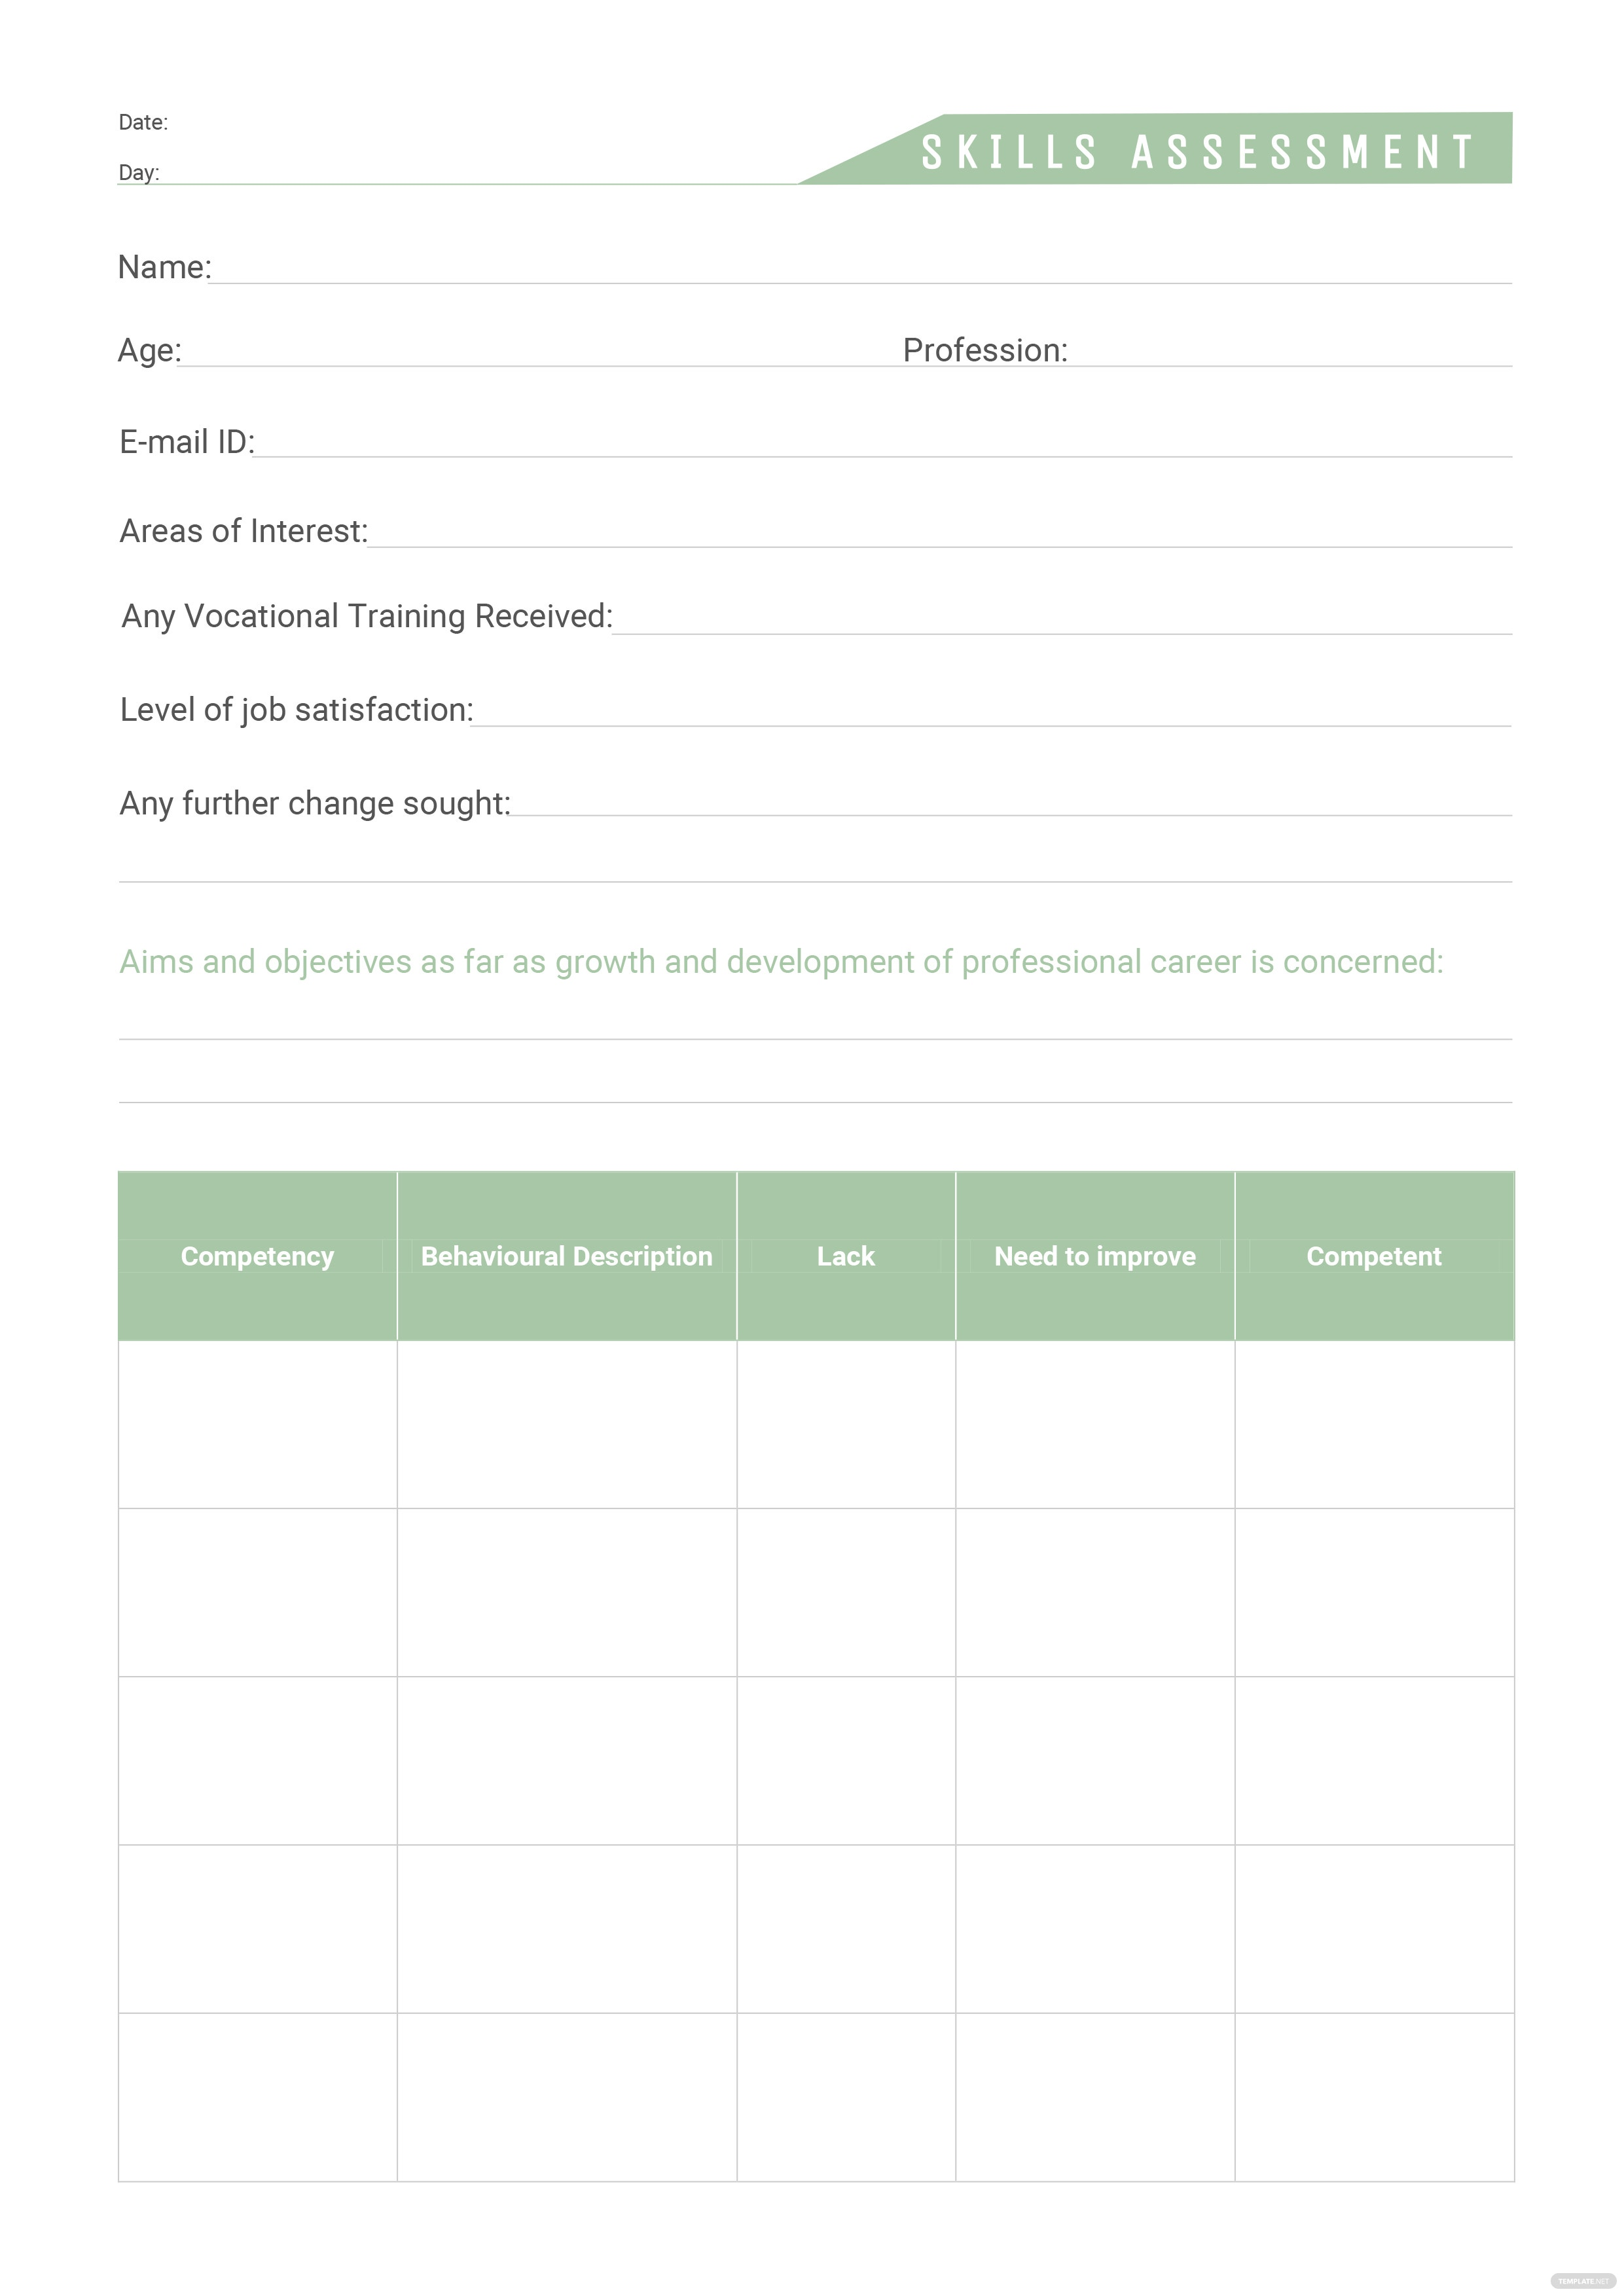 Erfreut Skills Assessment Template Zeitgenössisch - FORTSETZUNG ...